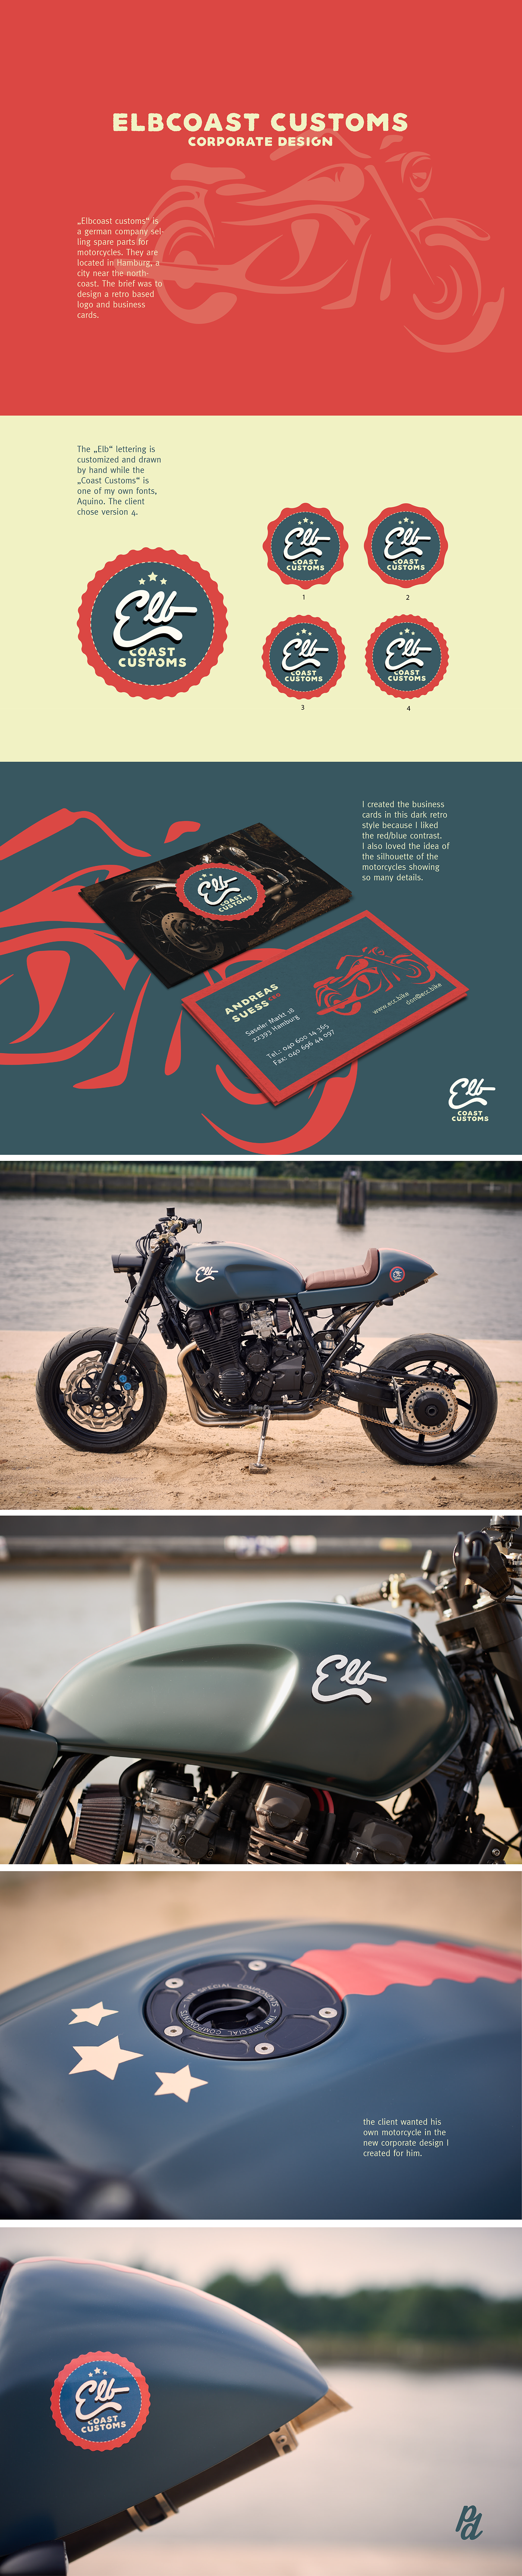 Reto vintage elbcoast customs motorcycle sport hamburg west coast Coast north coast beach logo AQUINO